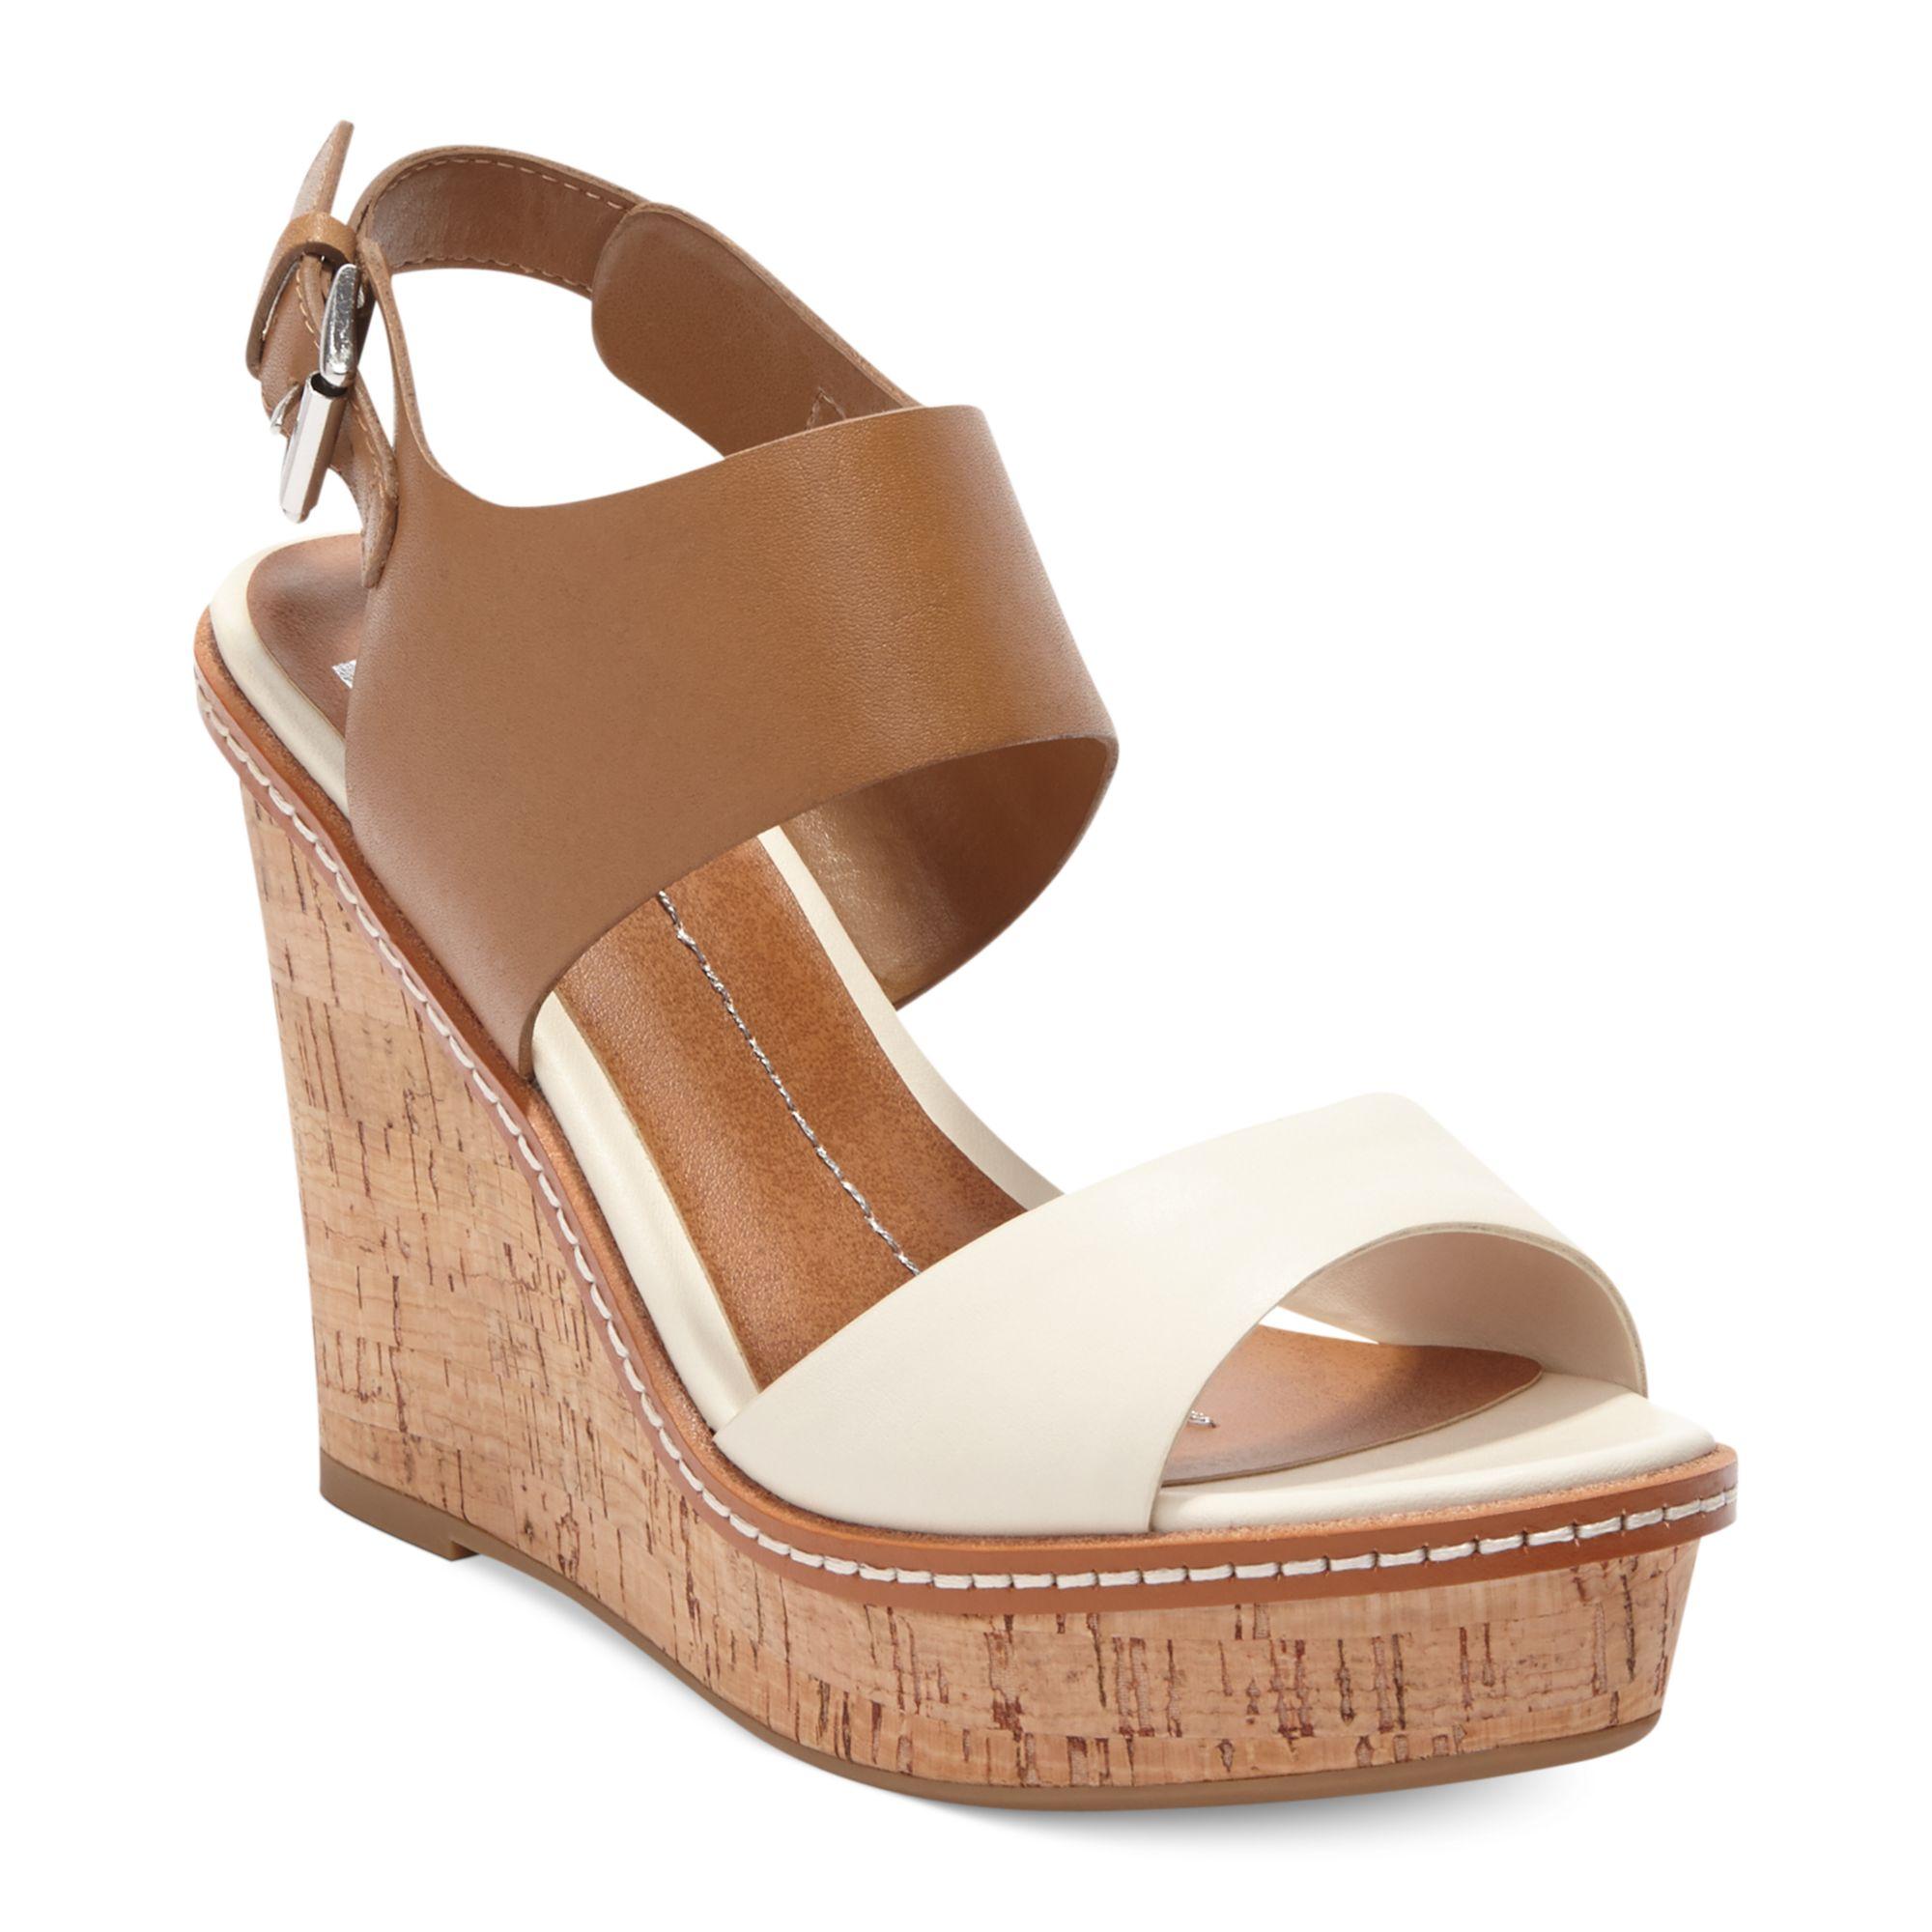 dolce vita dv by jonee platform wedge sandals in brown